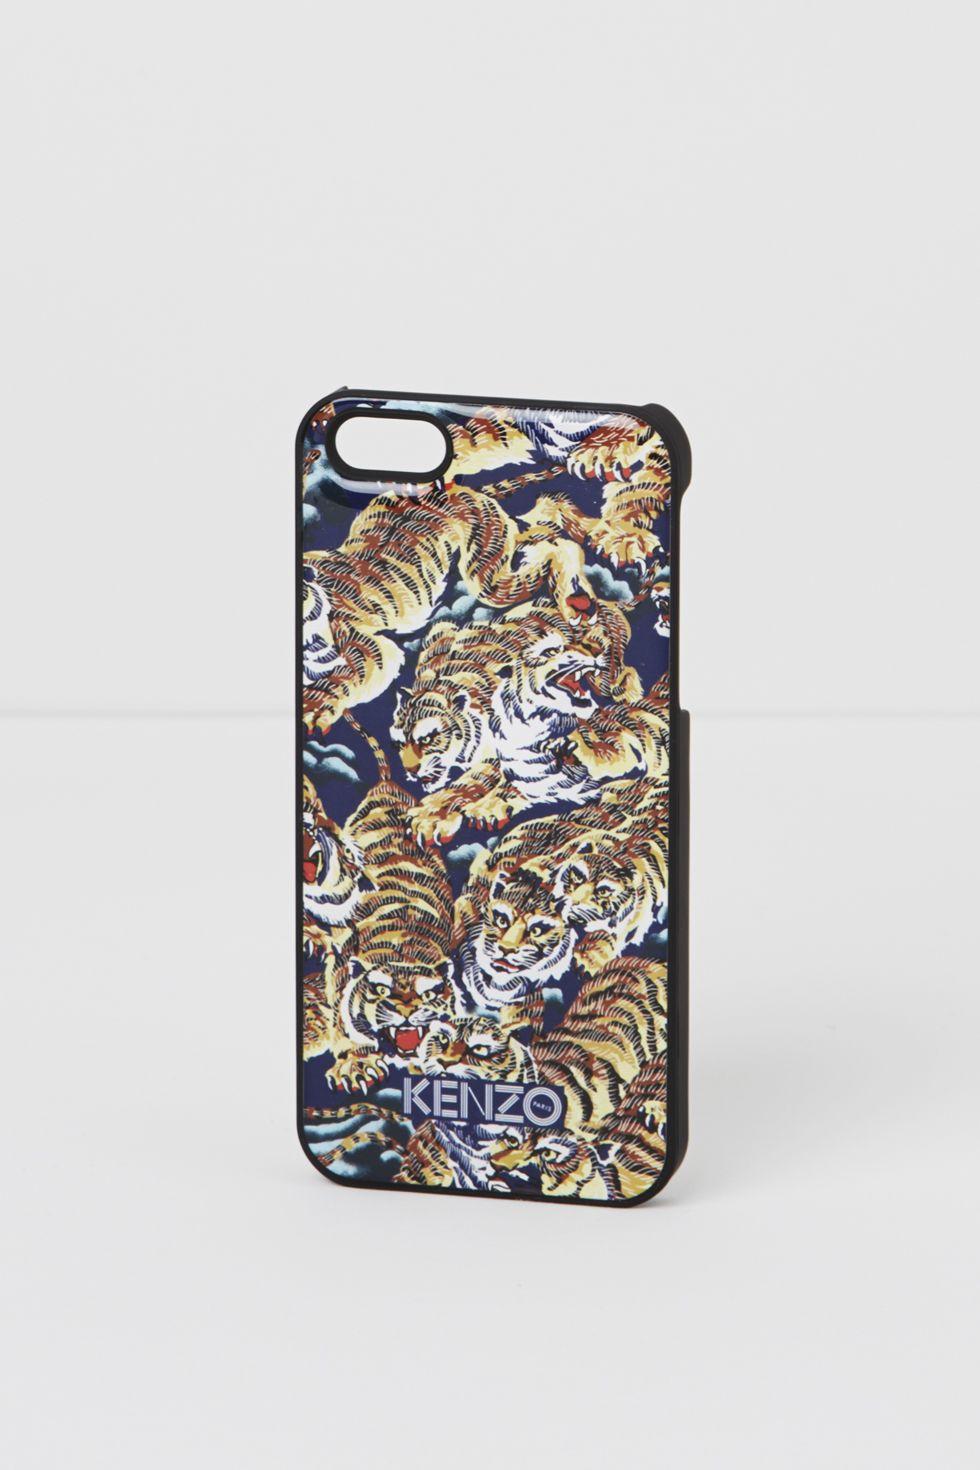 Handbags & Leather Goods Women | Iphone cases, Iphone, Iphone 5 case